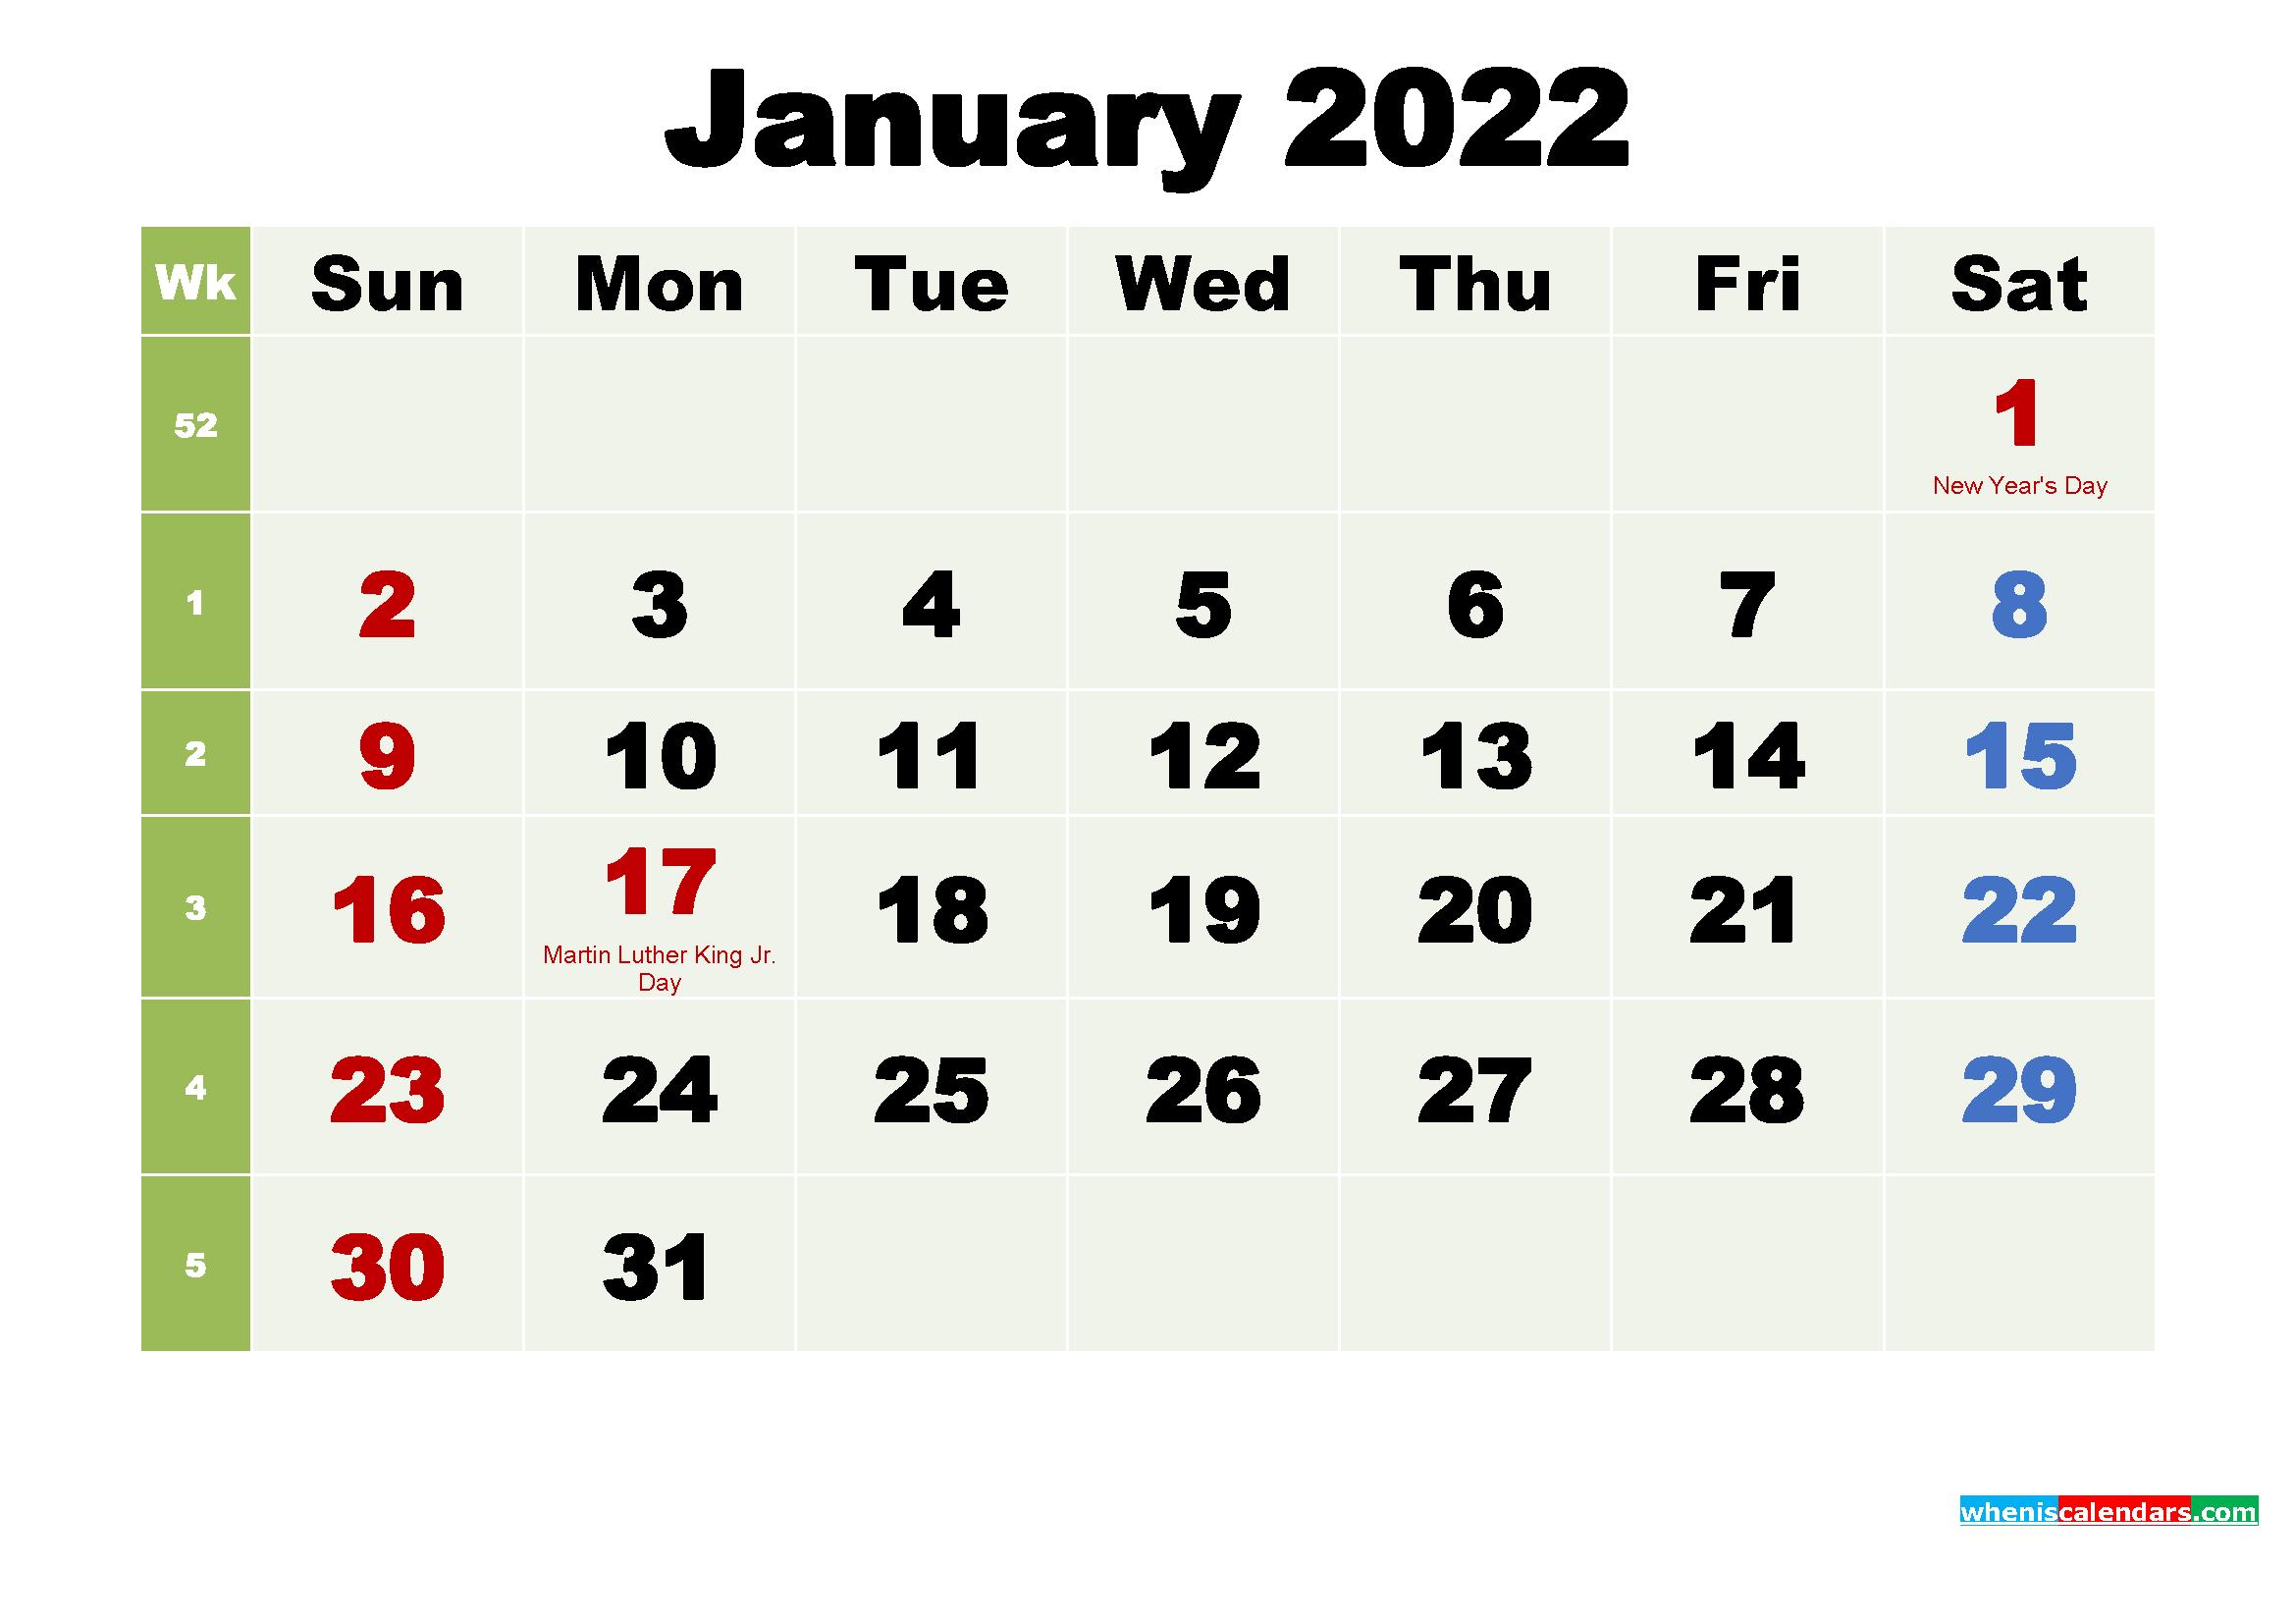 Free Printable January 2022 Calendar With Holidays - Free regarding January 2022 Calendar Printable Free Graphics